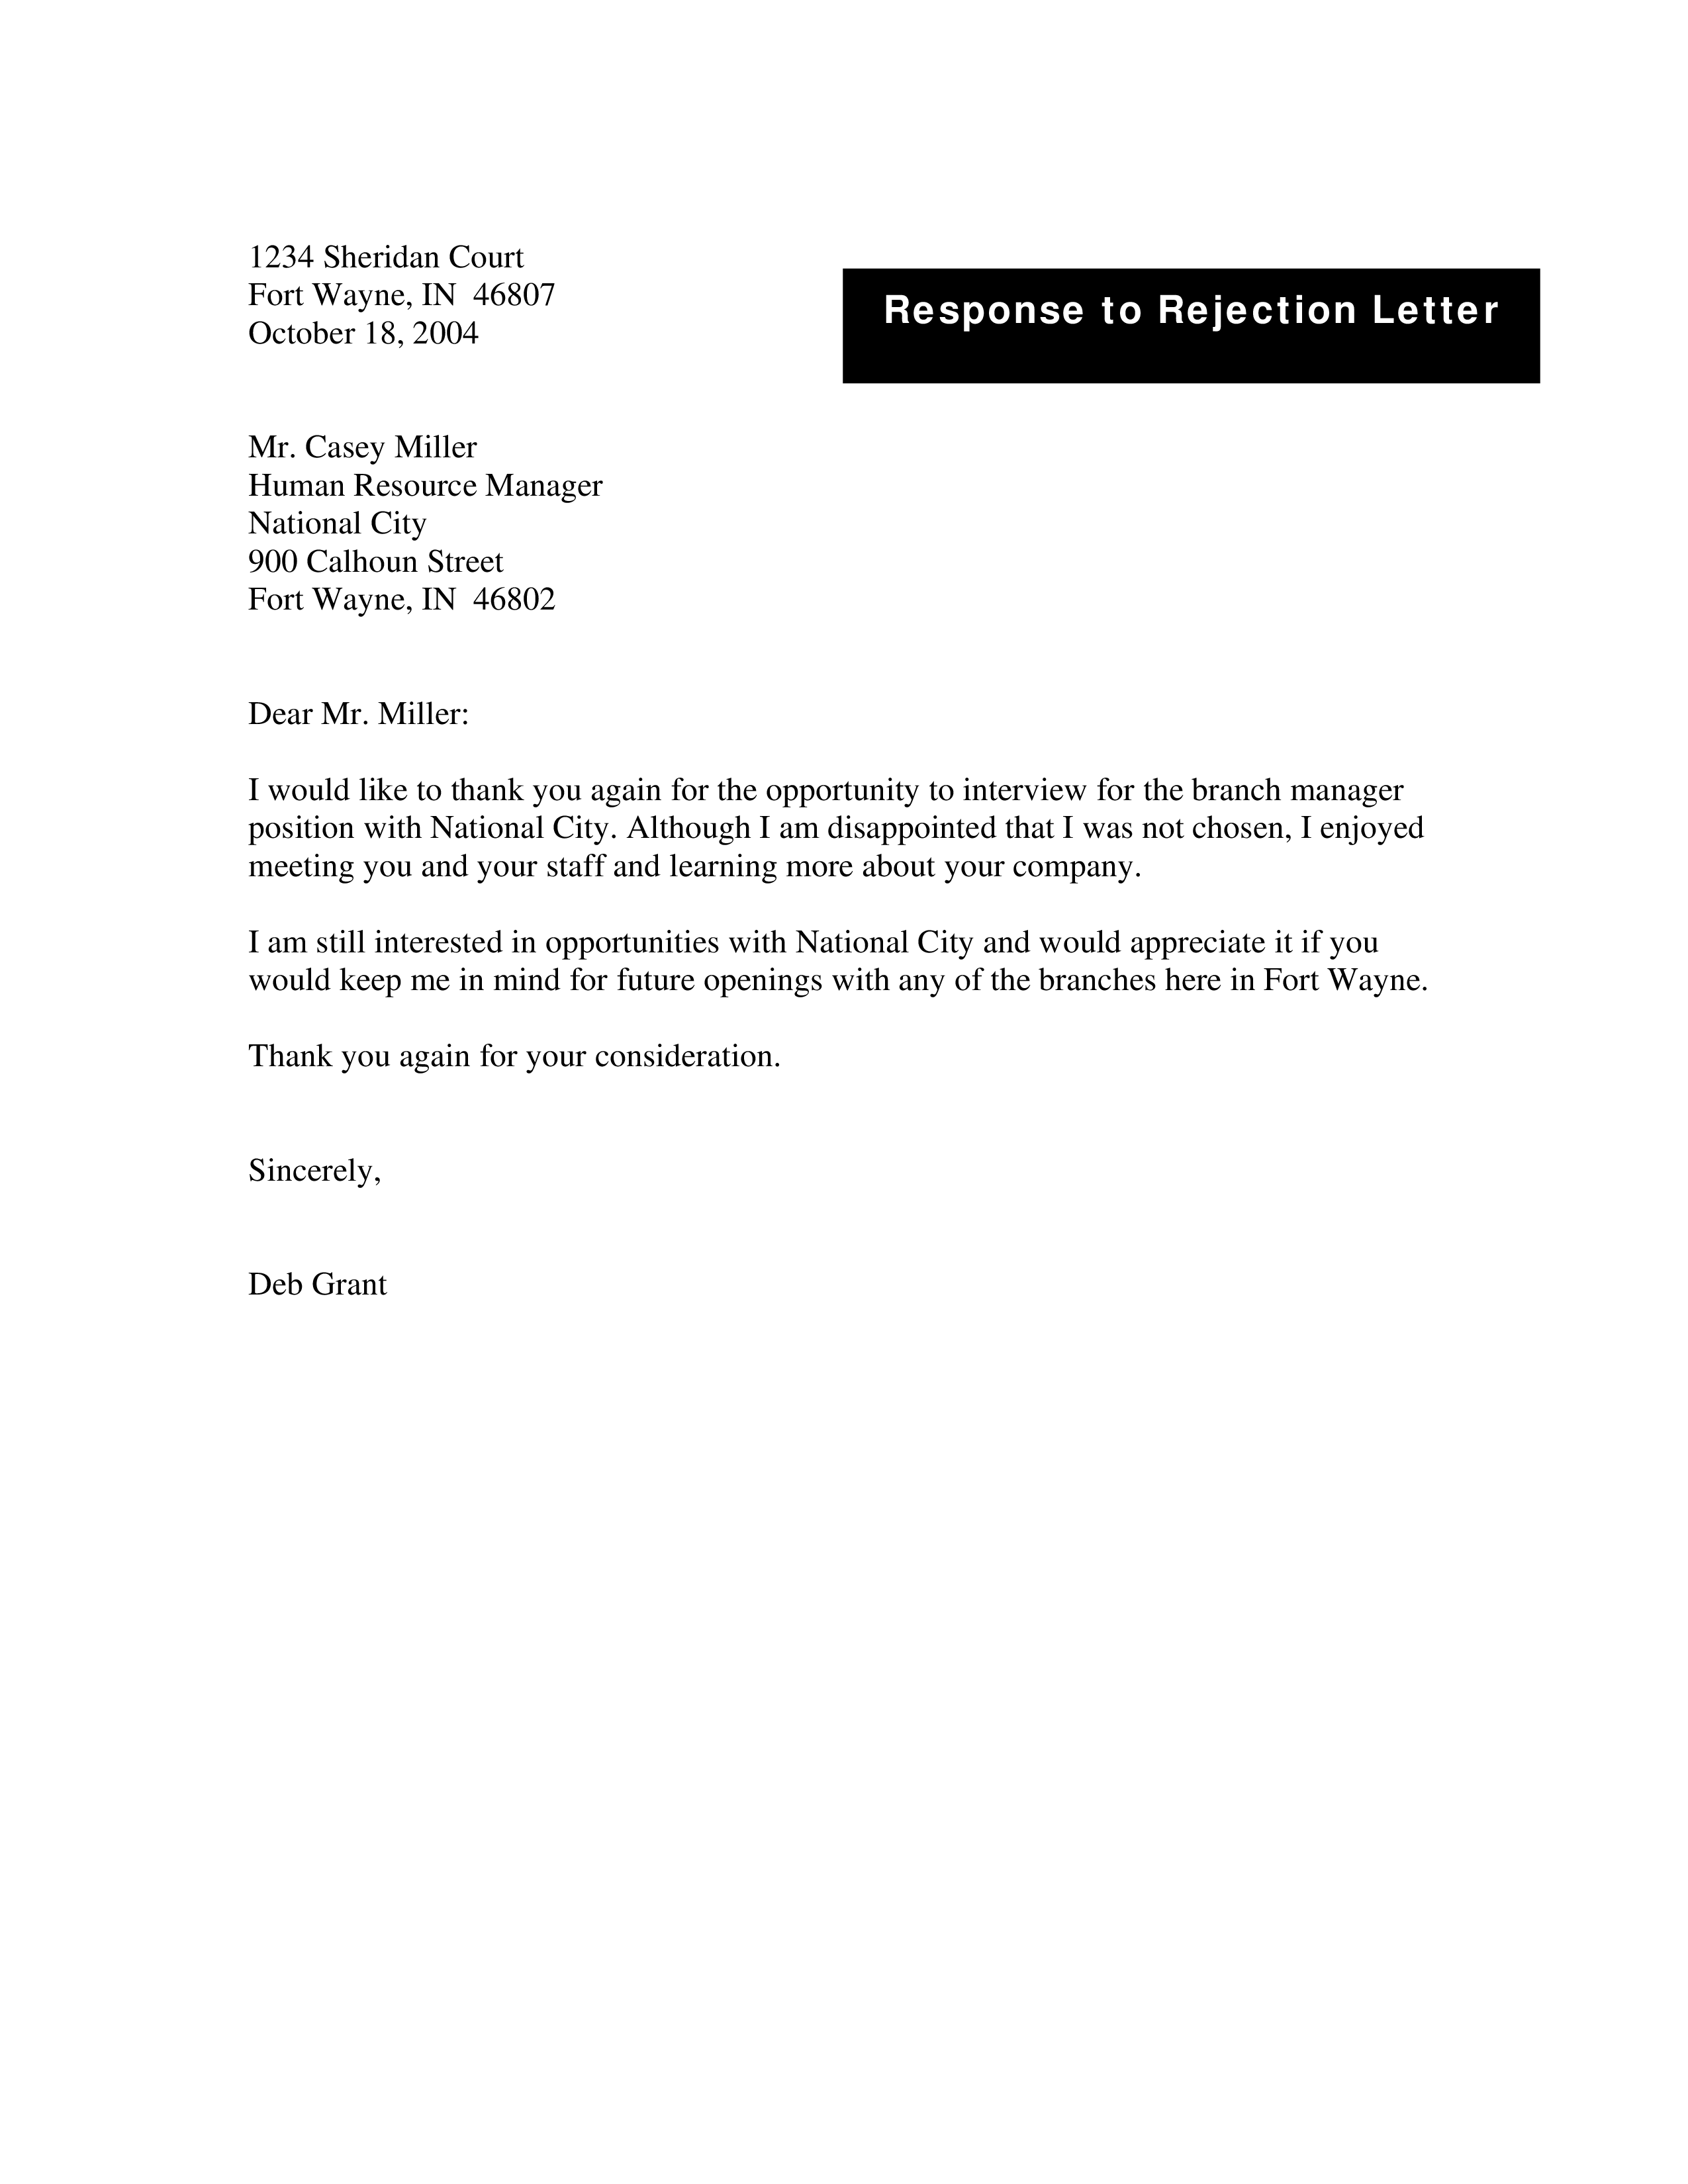 Free Rejection Tender Letter Templates At Allbusinesstemplates Com